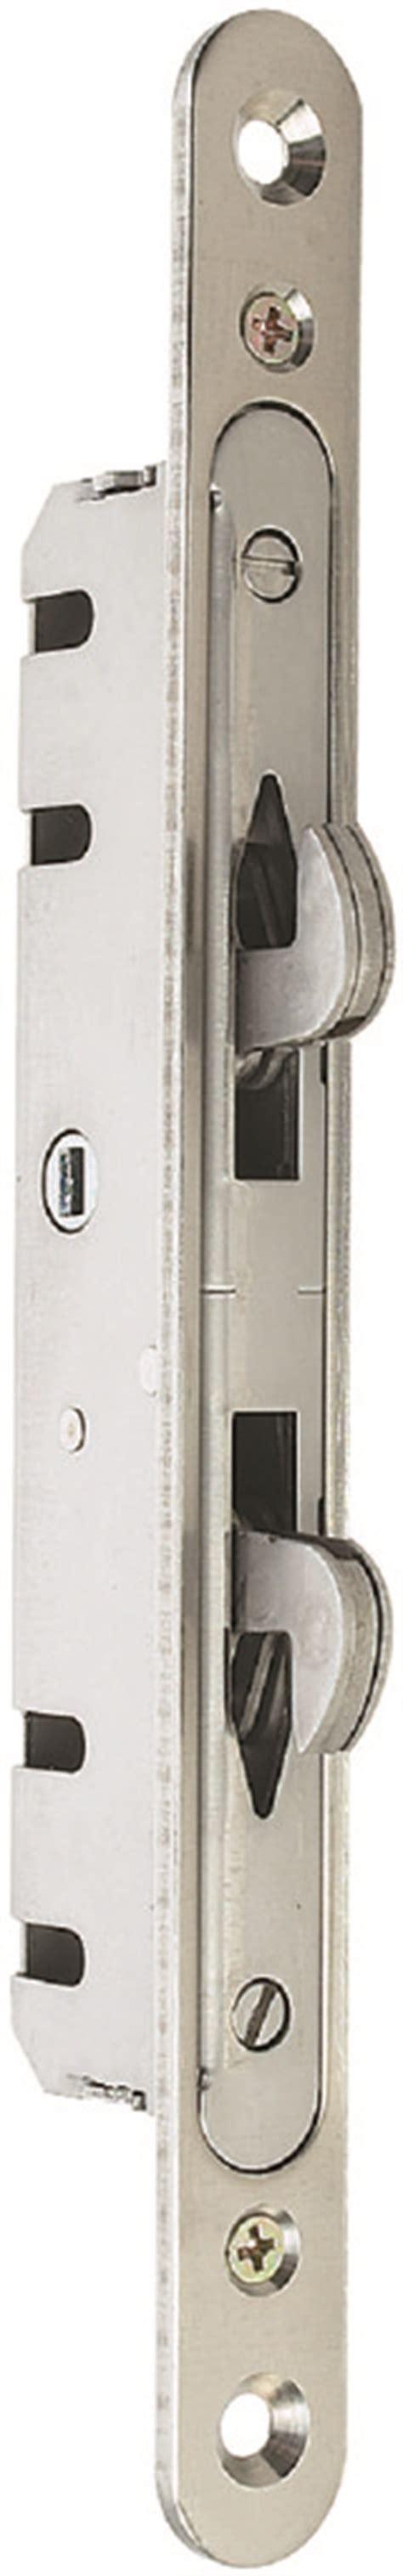 sliding patio door multipoint locks